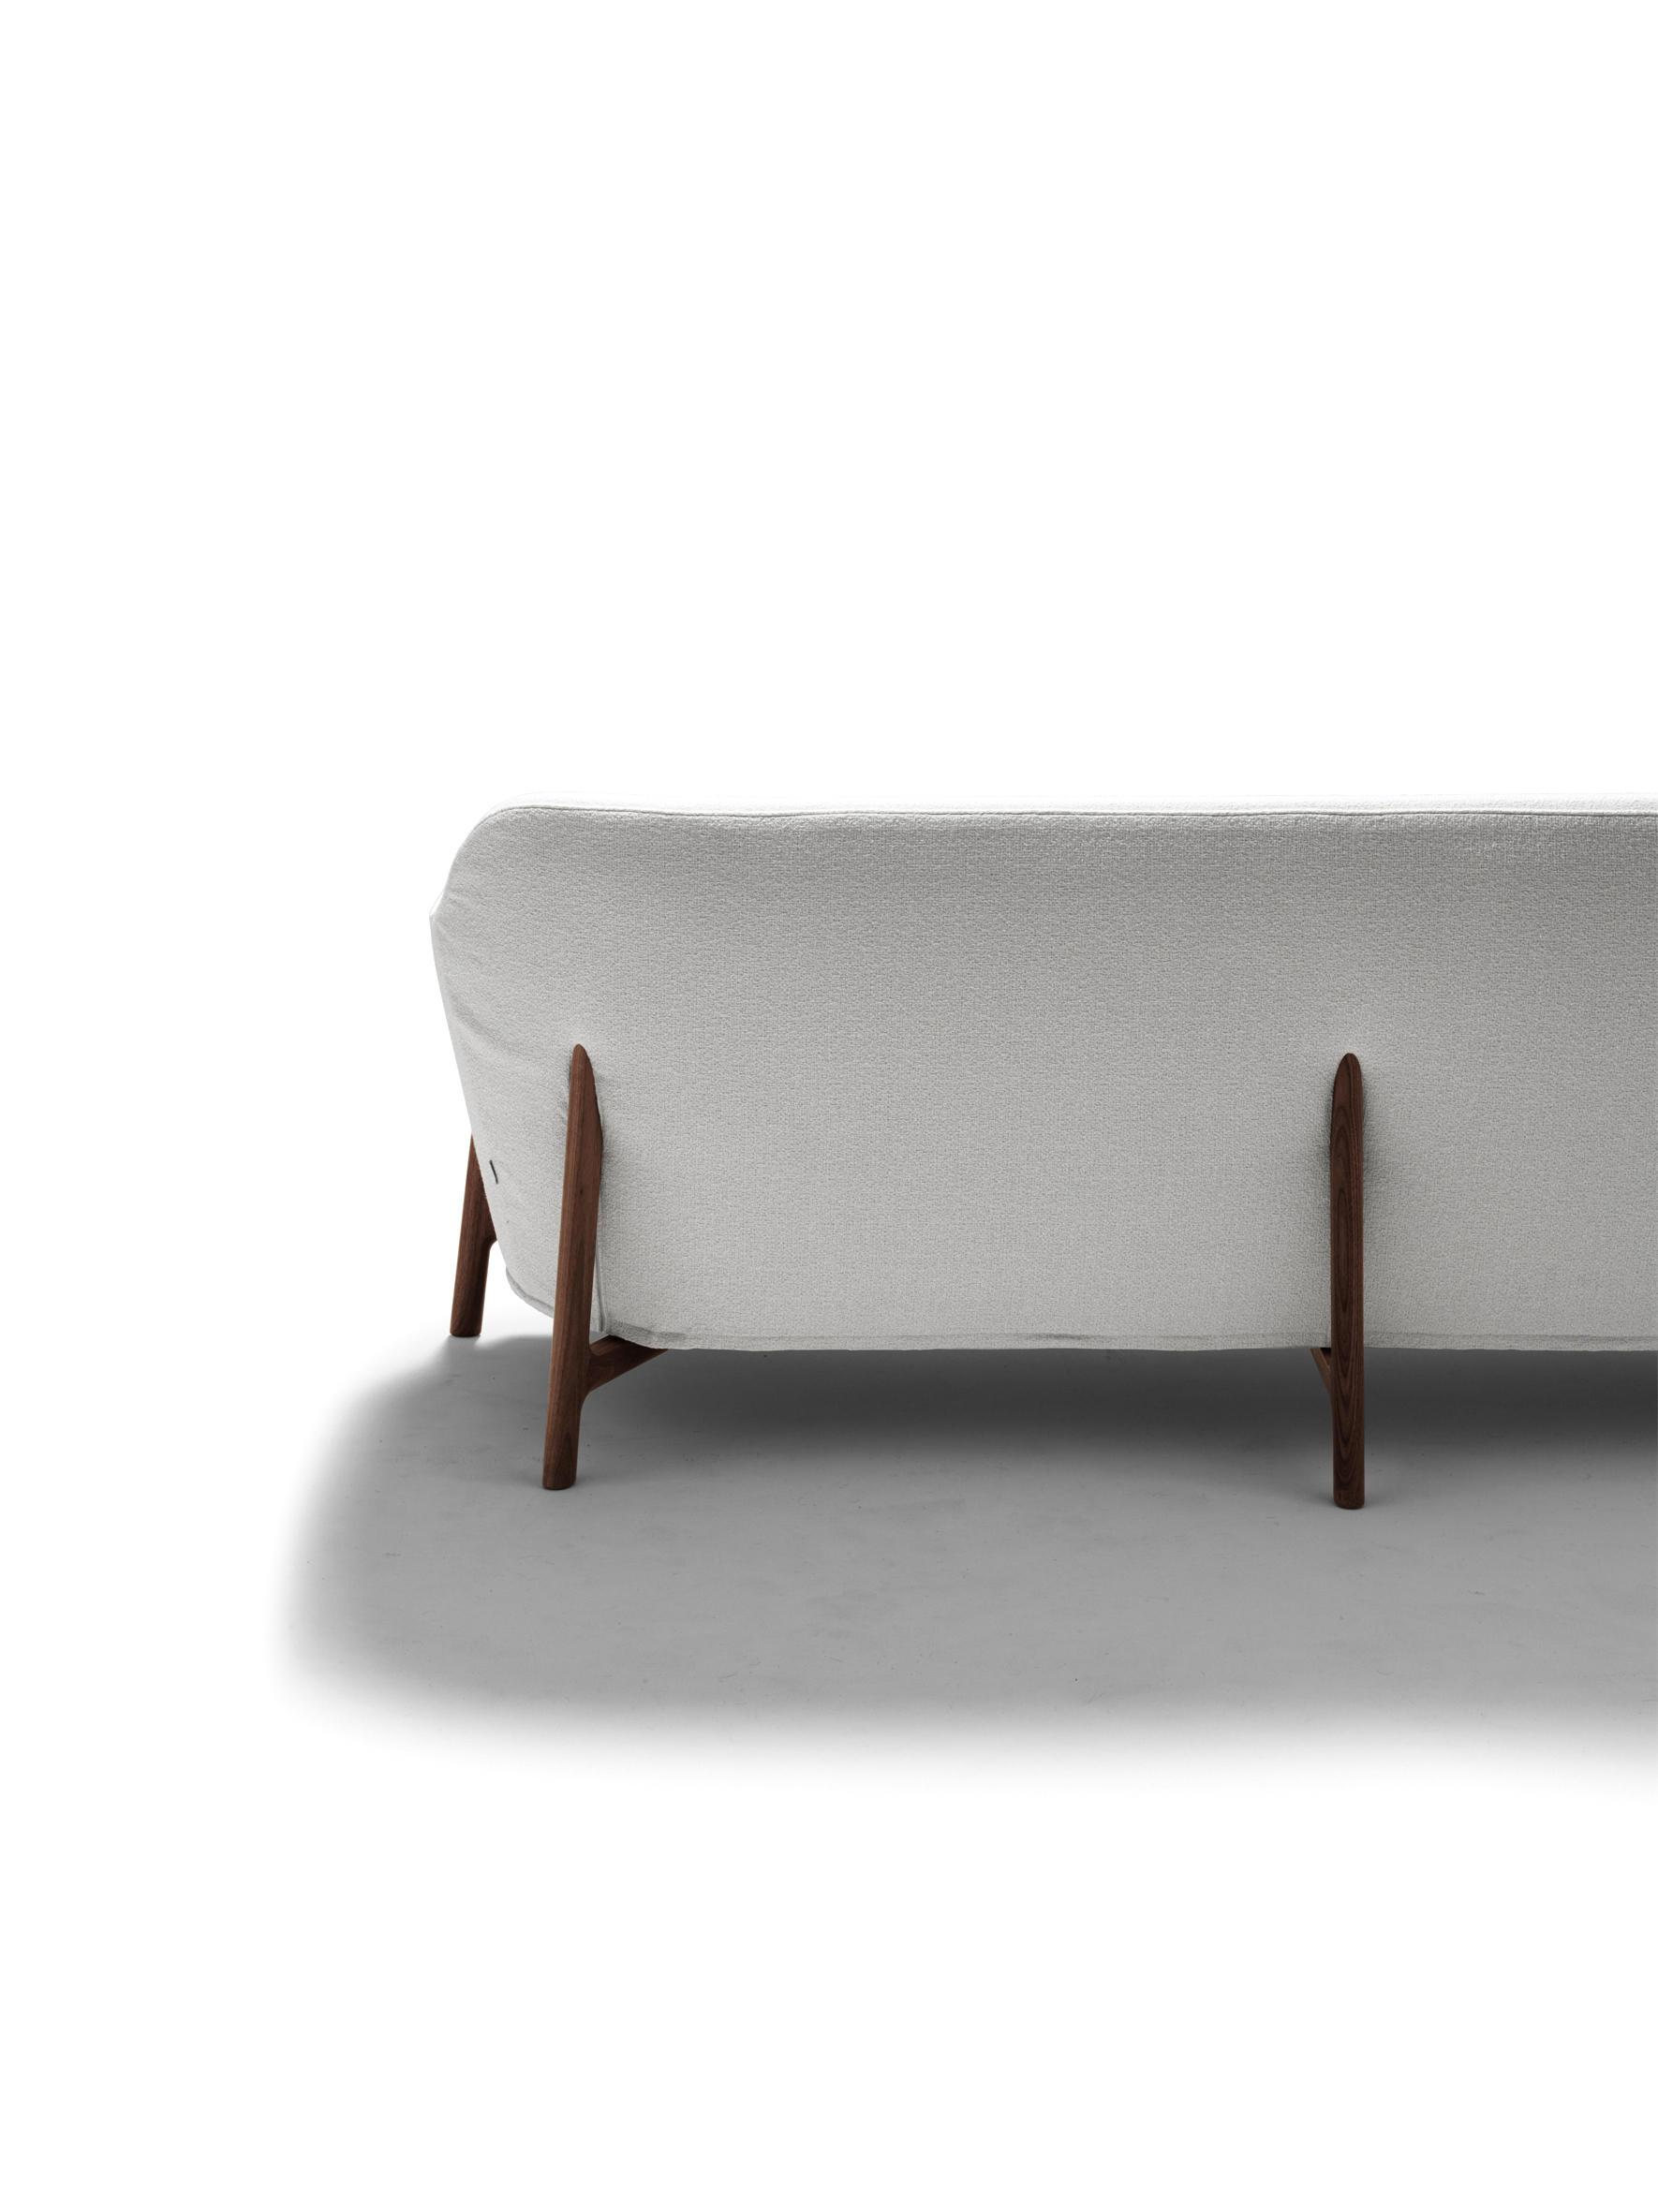 PILOTIS - Lounge sofas from De Padova | Architonic